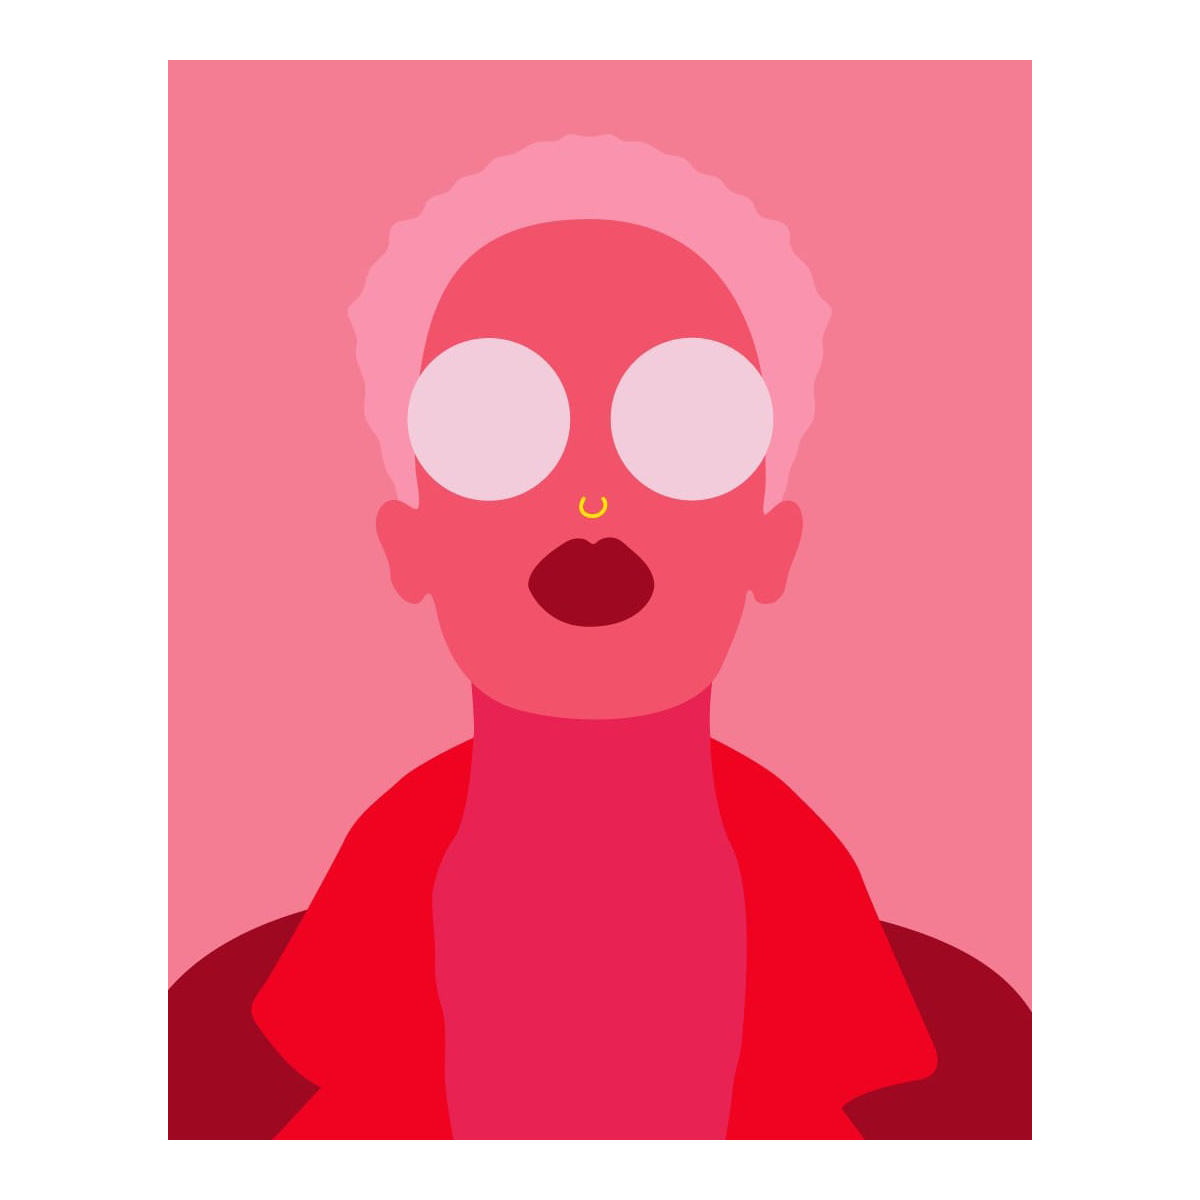 byisabel 'BIG EYES' Art Print